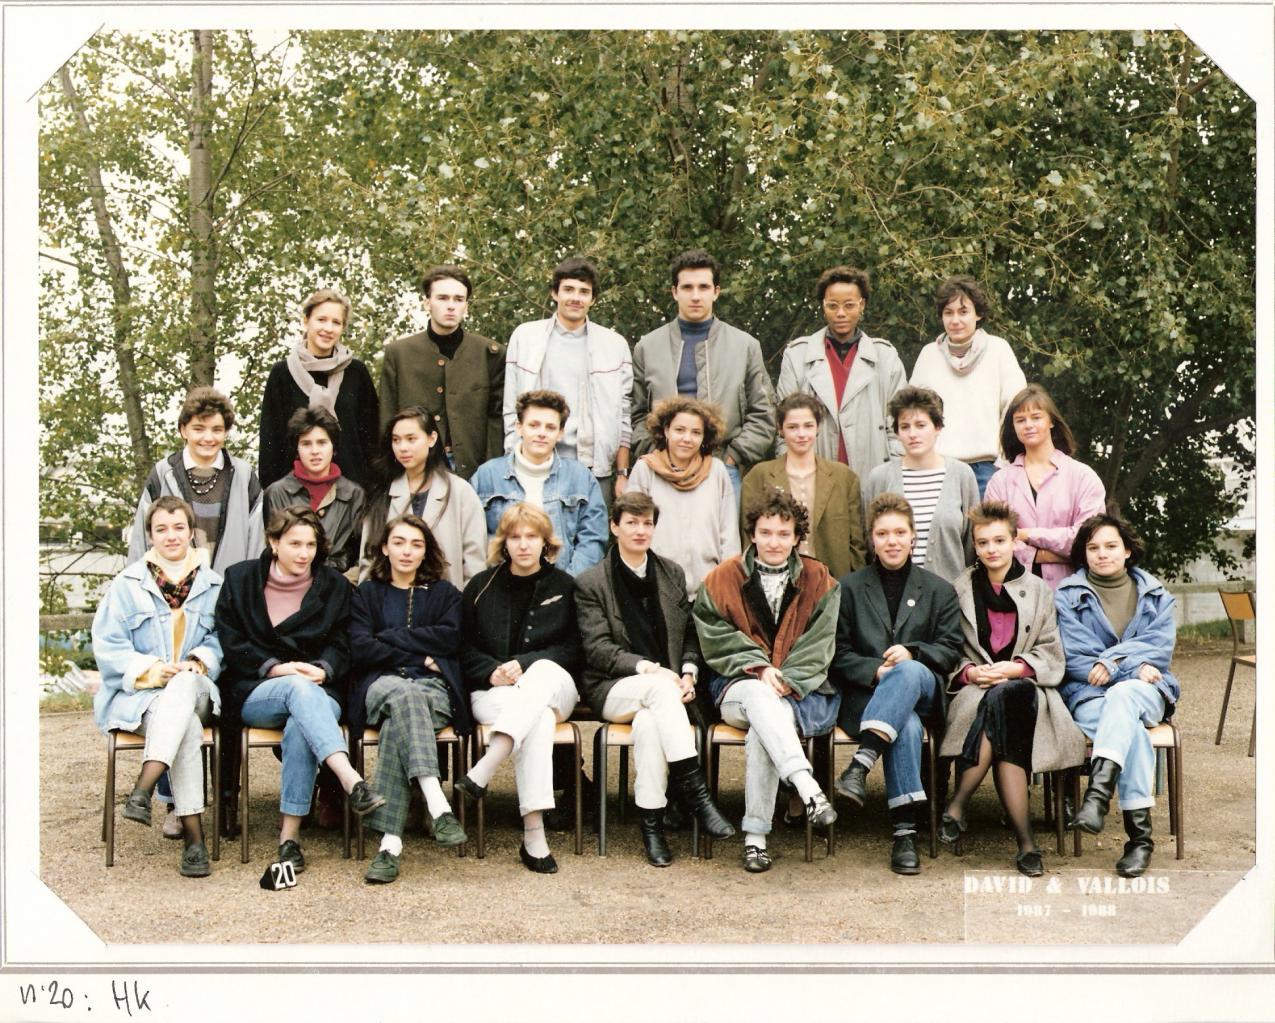 1988 - HK